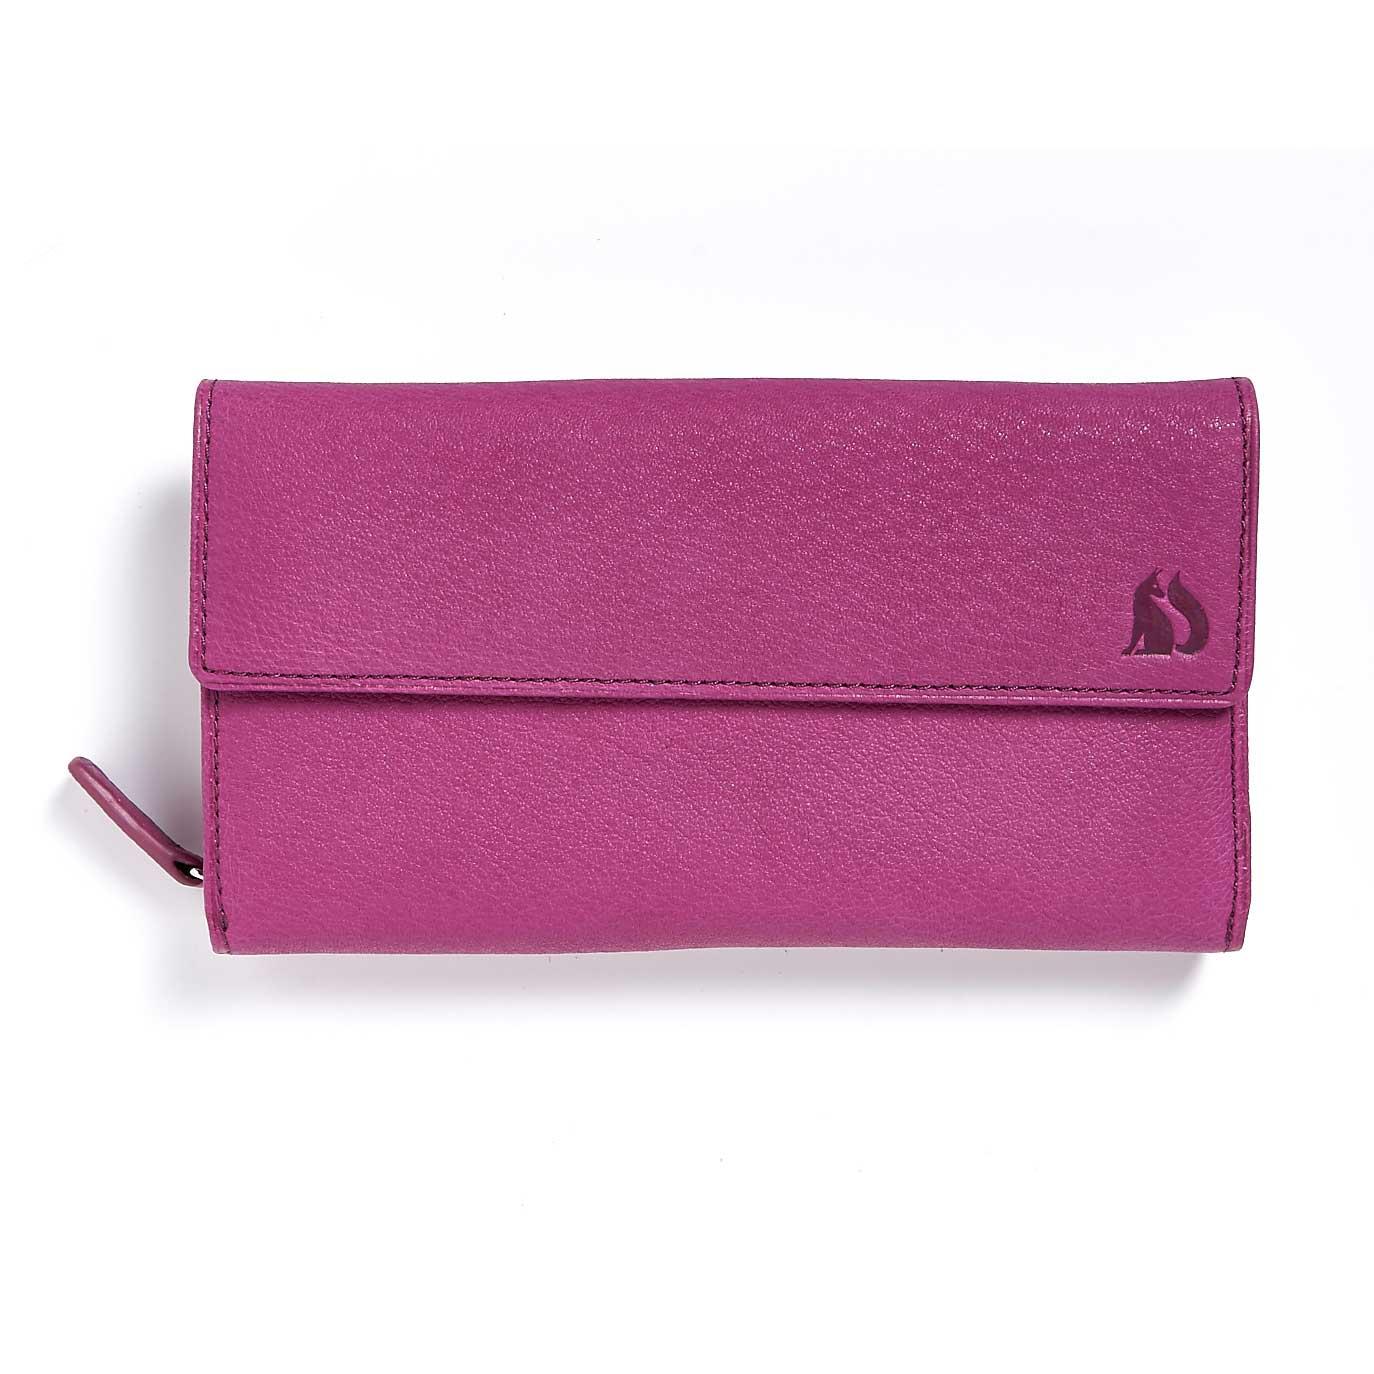 grizedale foxfield berry leather purse